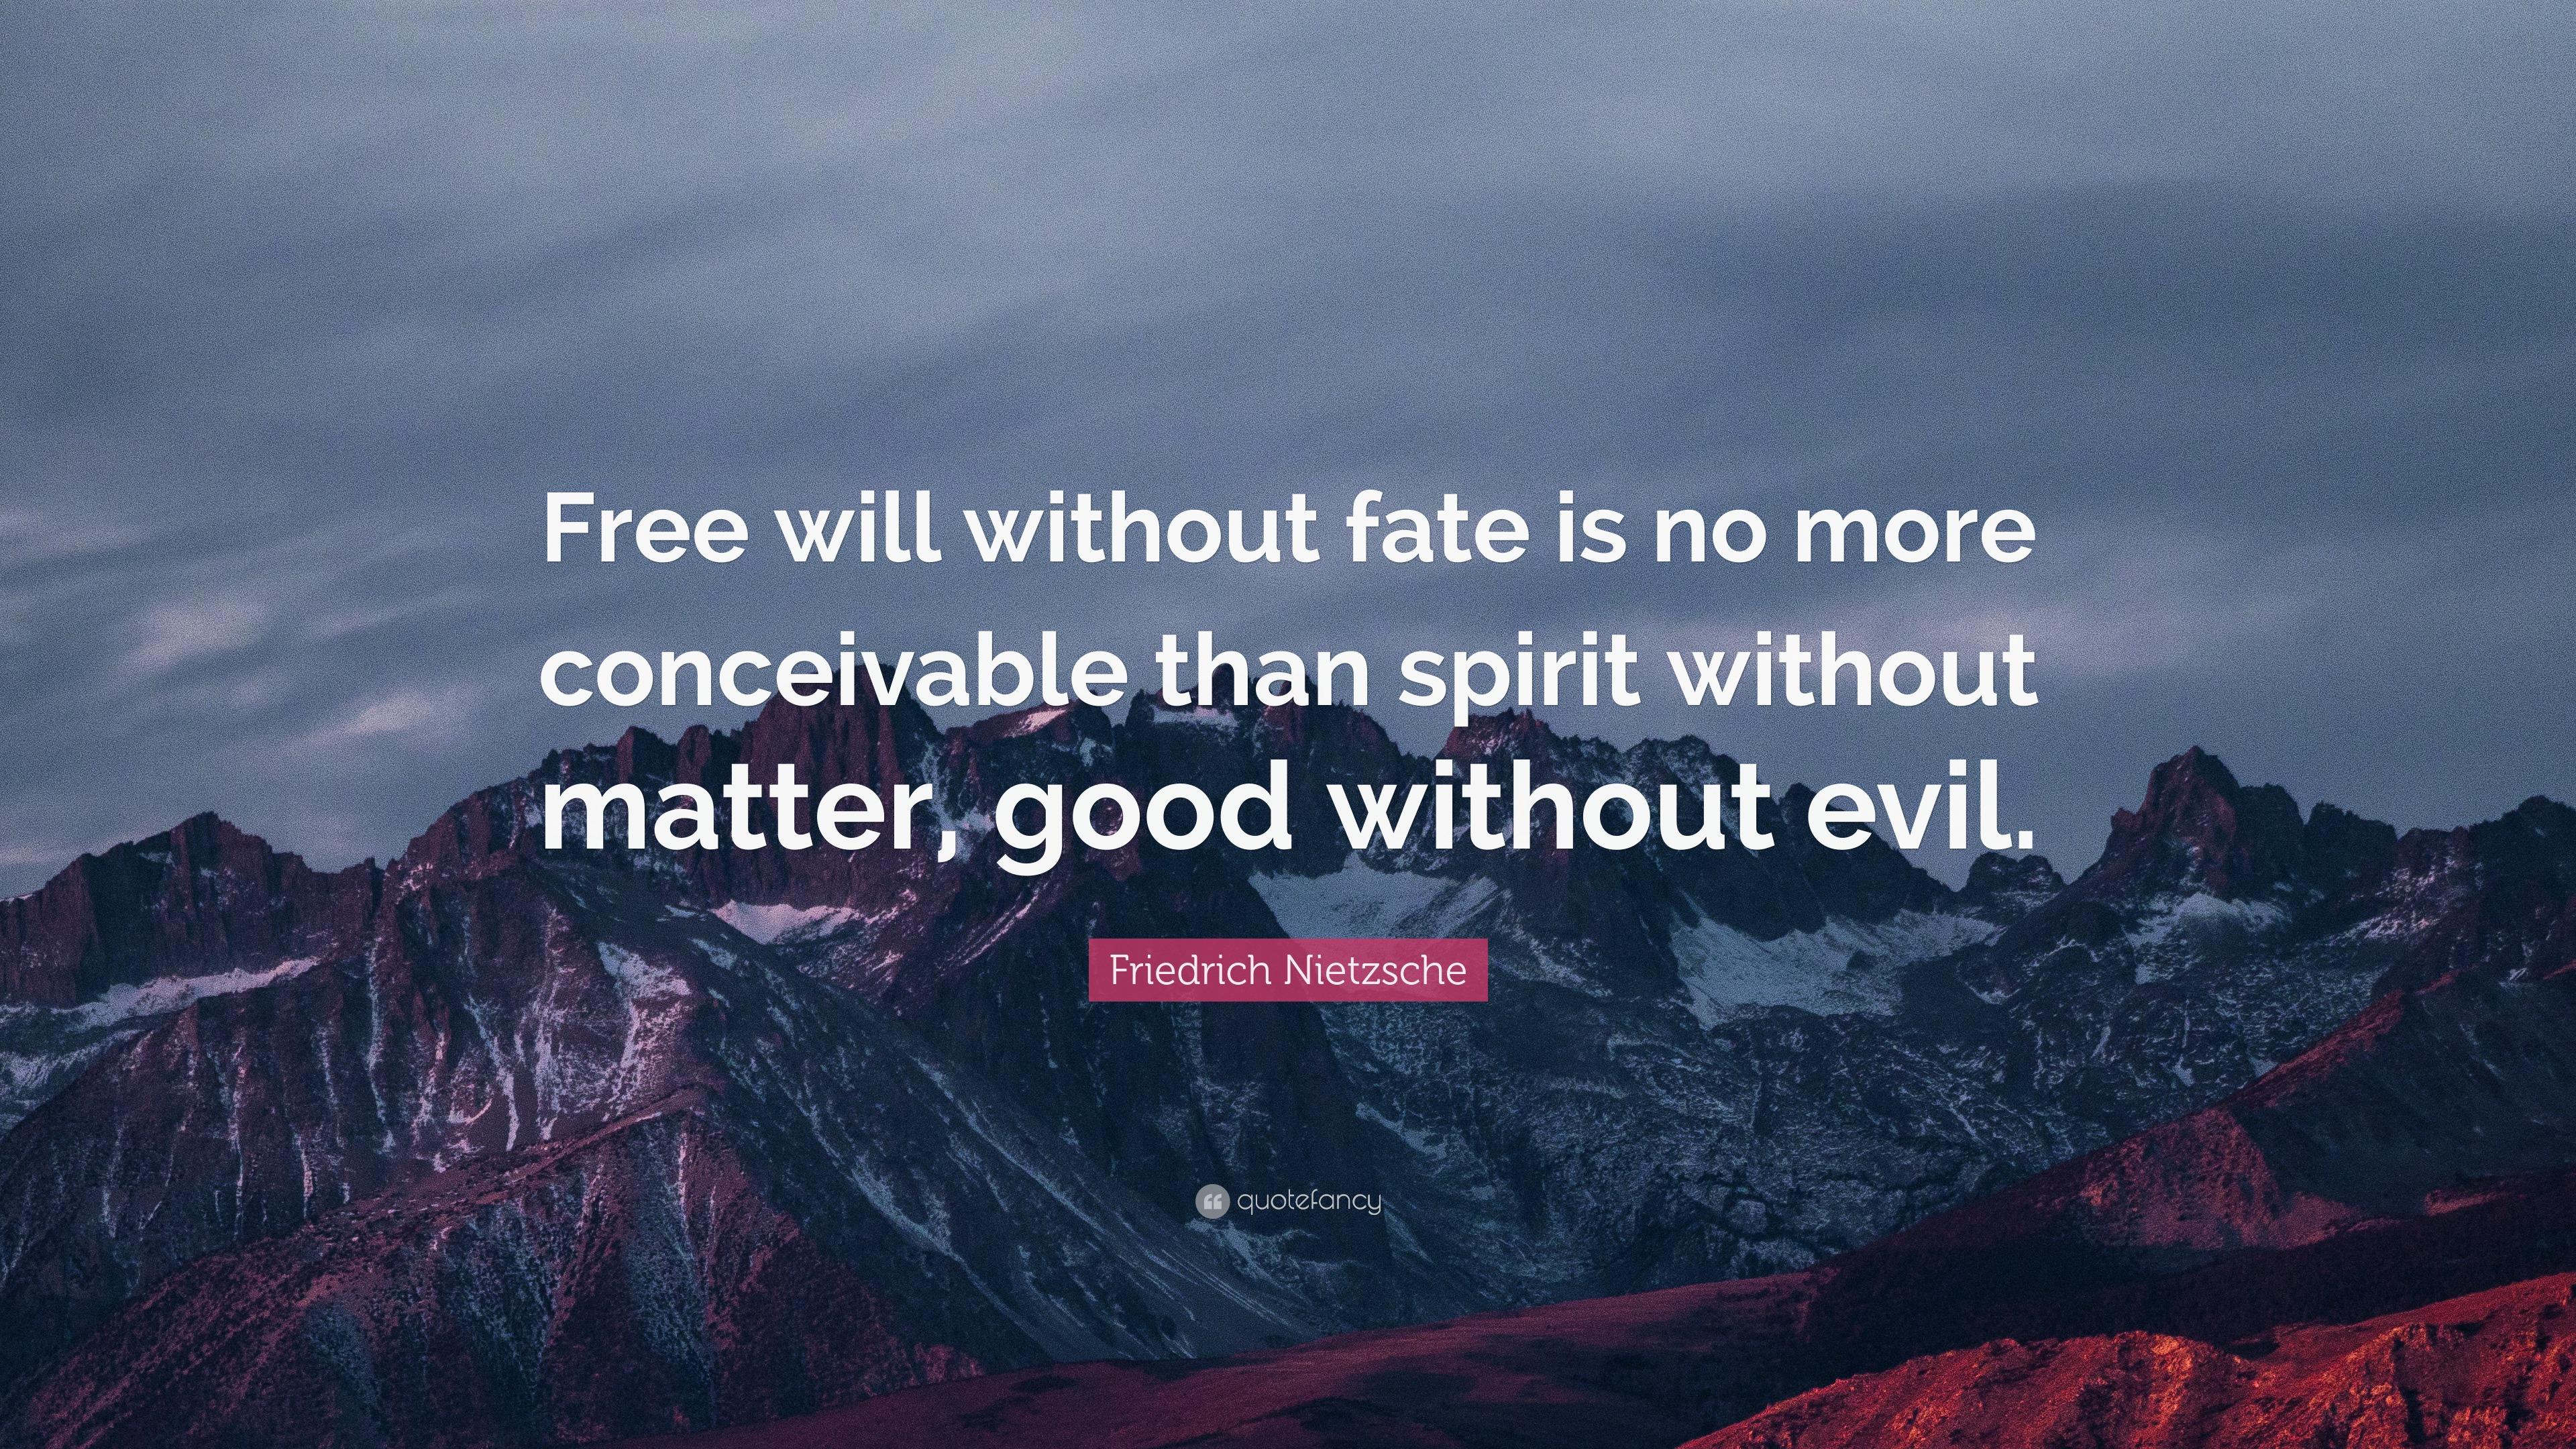 Quotes Of Free Kleobergdorfbibco